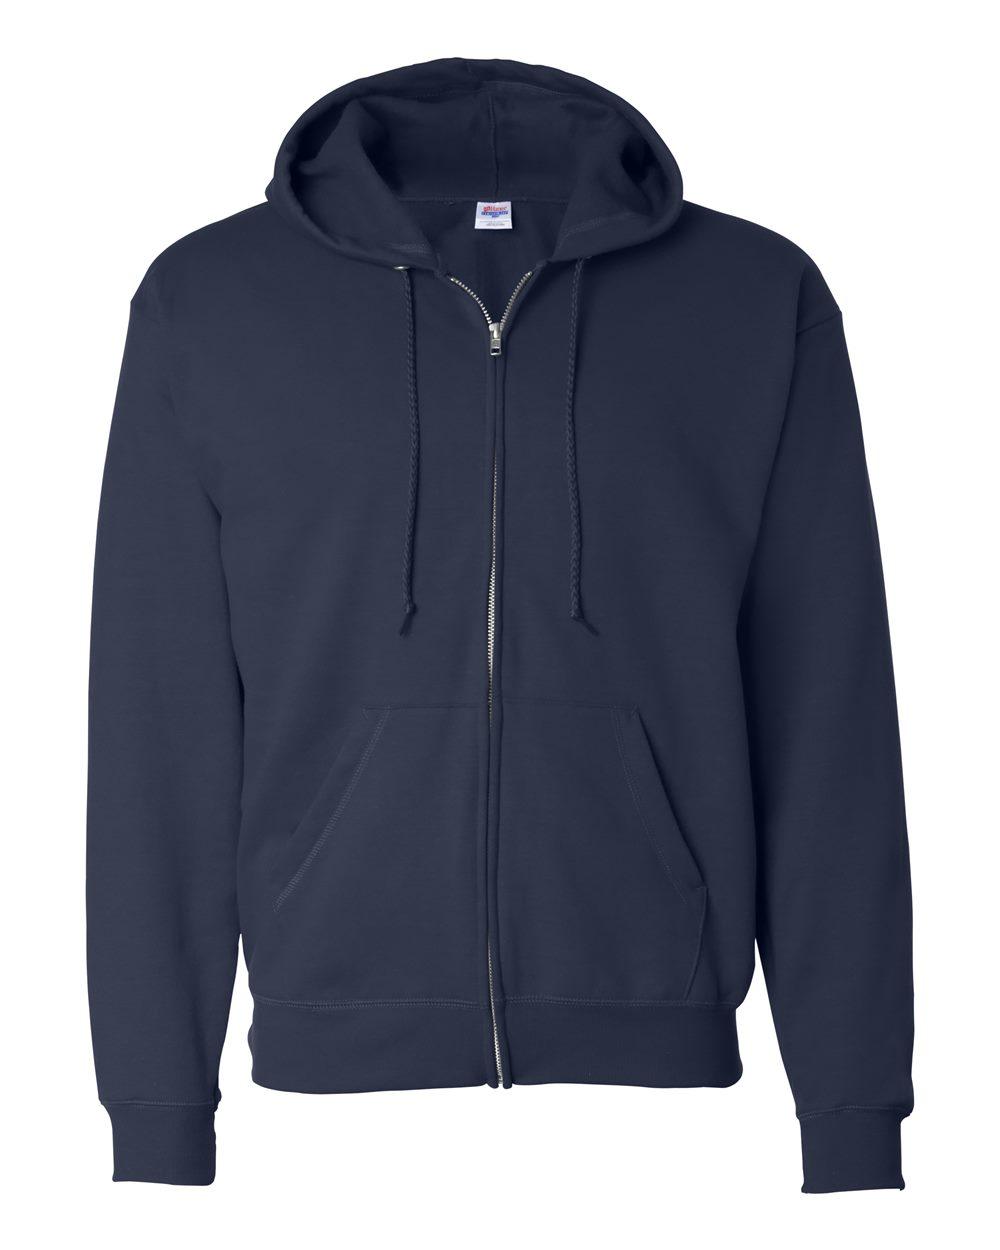 Hanes-Mens-Ecosmart-Blend-Full-Zip-Hooded-Sweatshirt-P180-up-to-3XL miniature 12